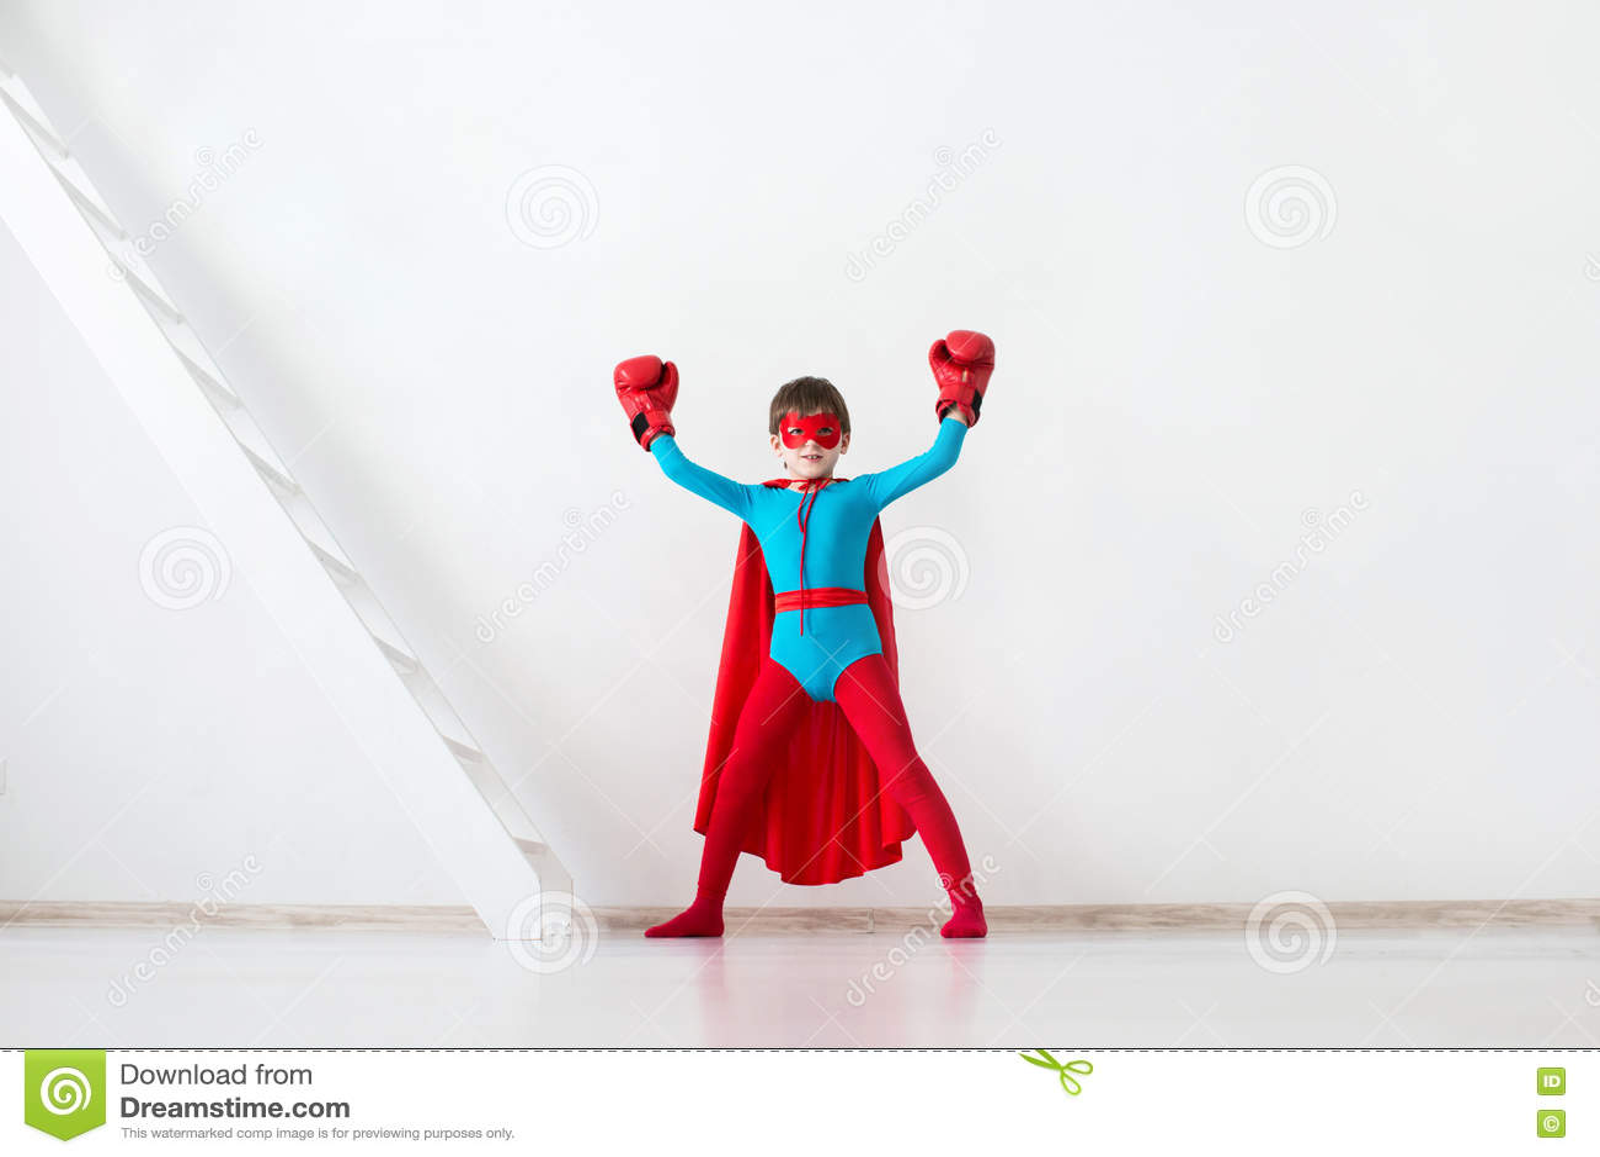 Winner. Kid Super Hero. Stock Photo 71730450 - Megapixl